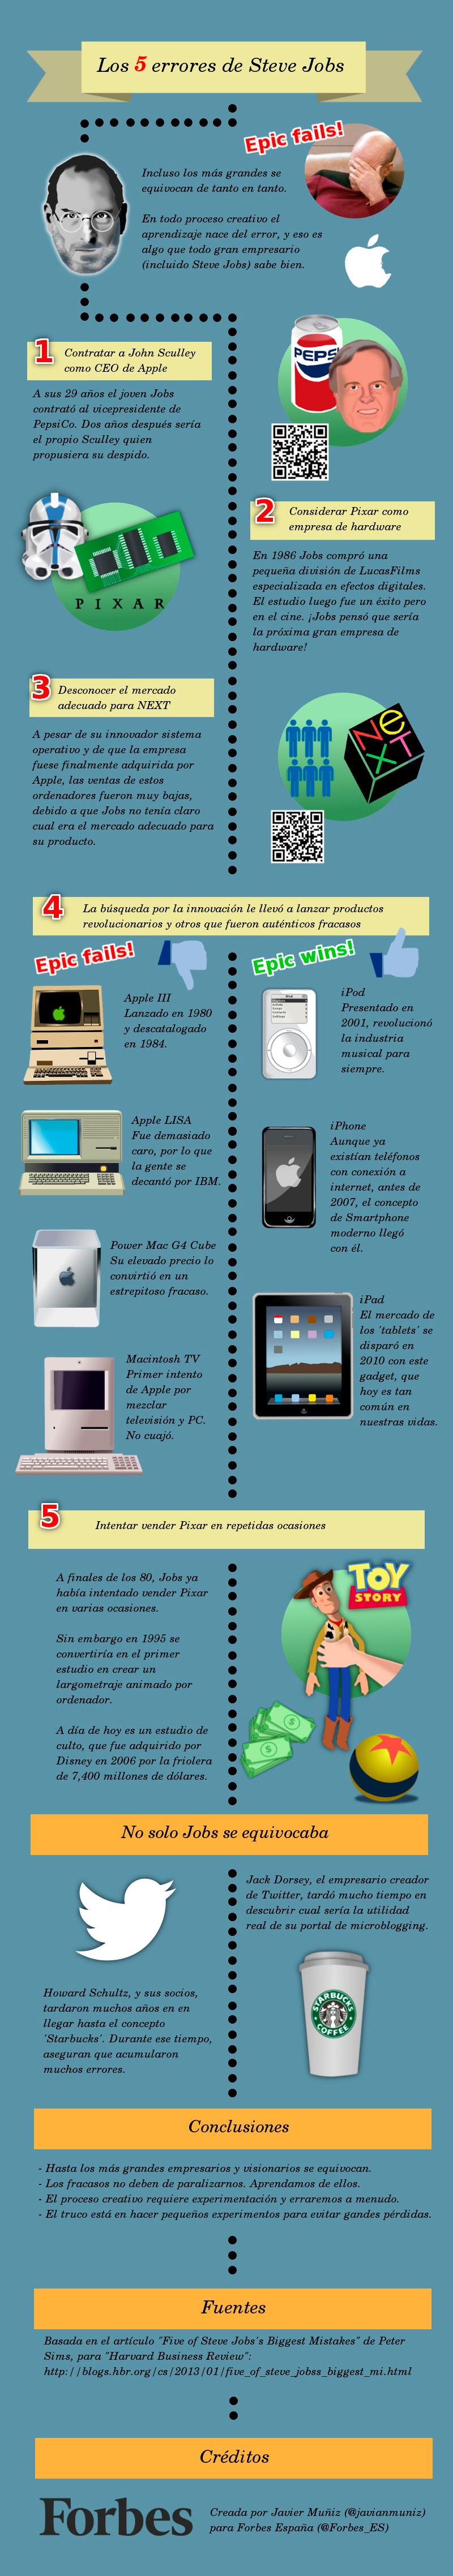 Los 5 errores de Steve Jobs